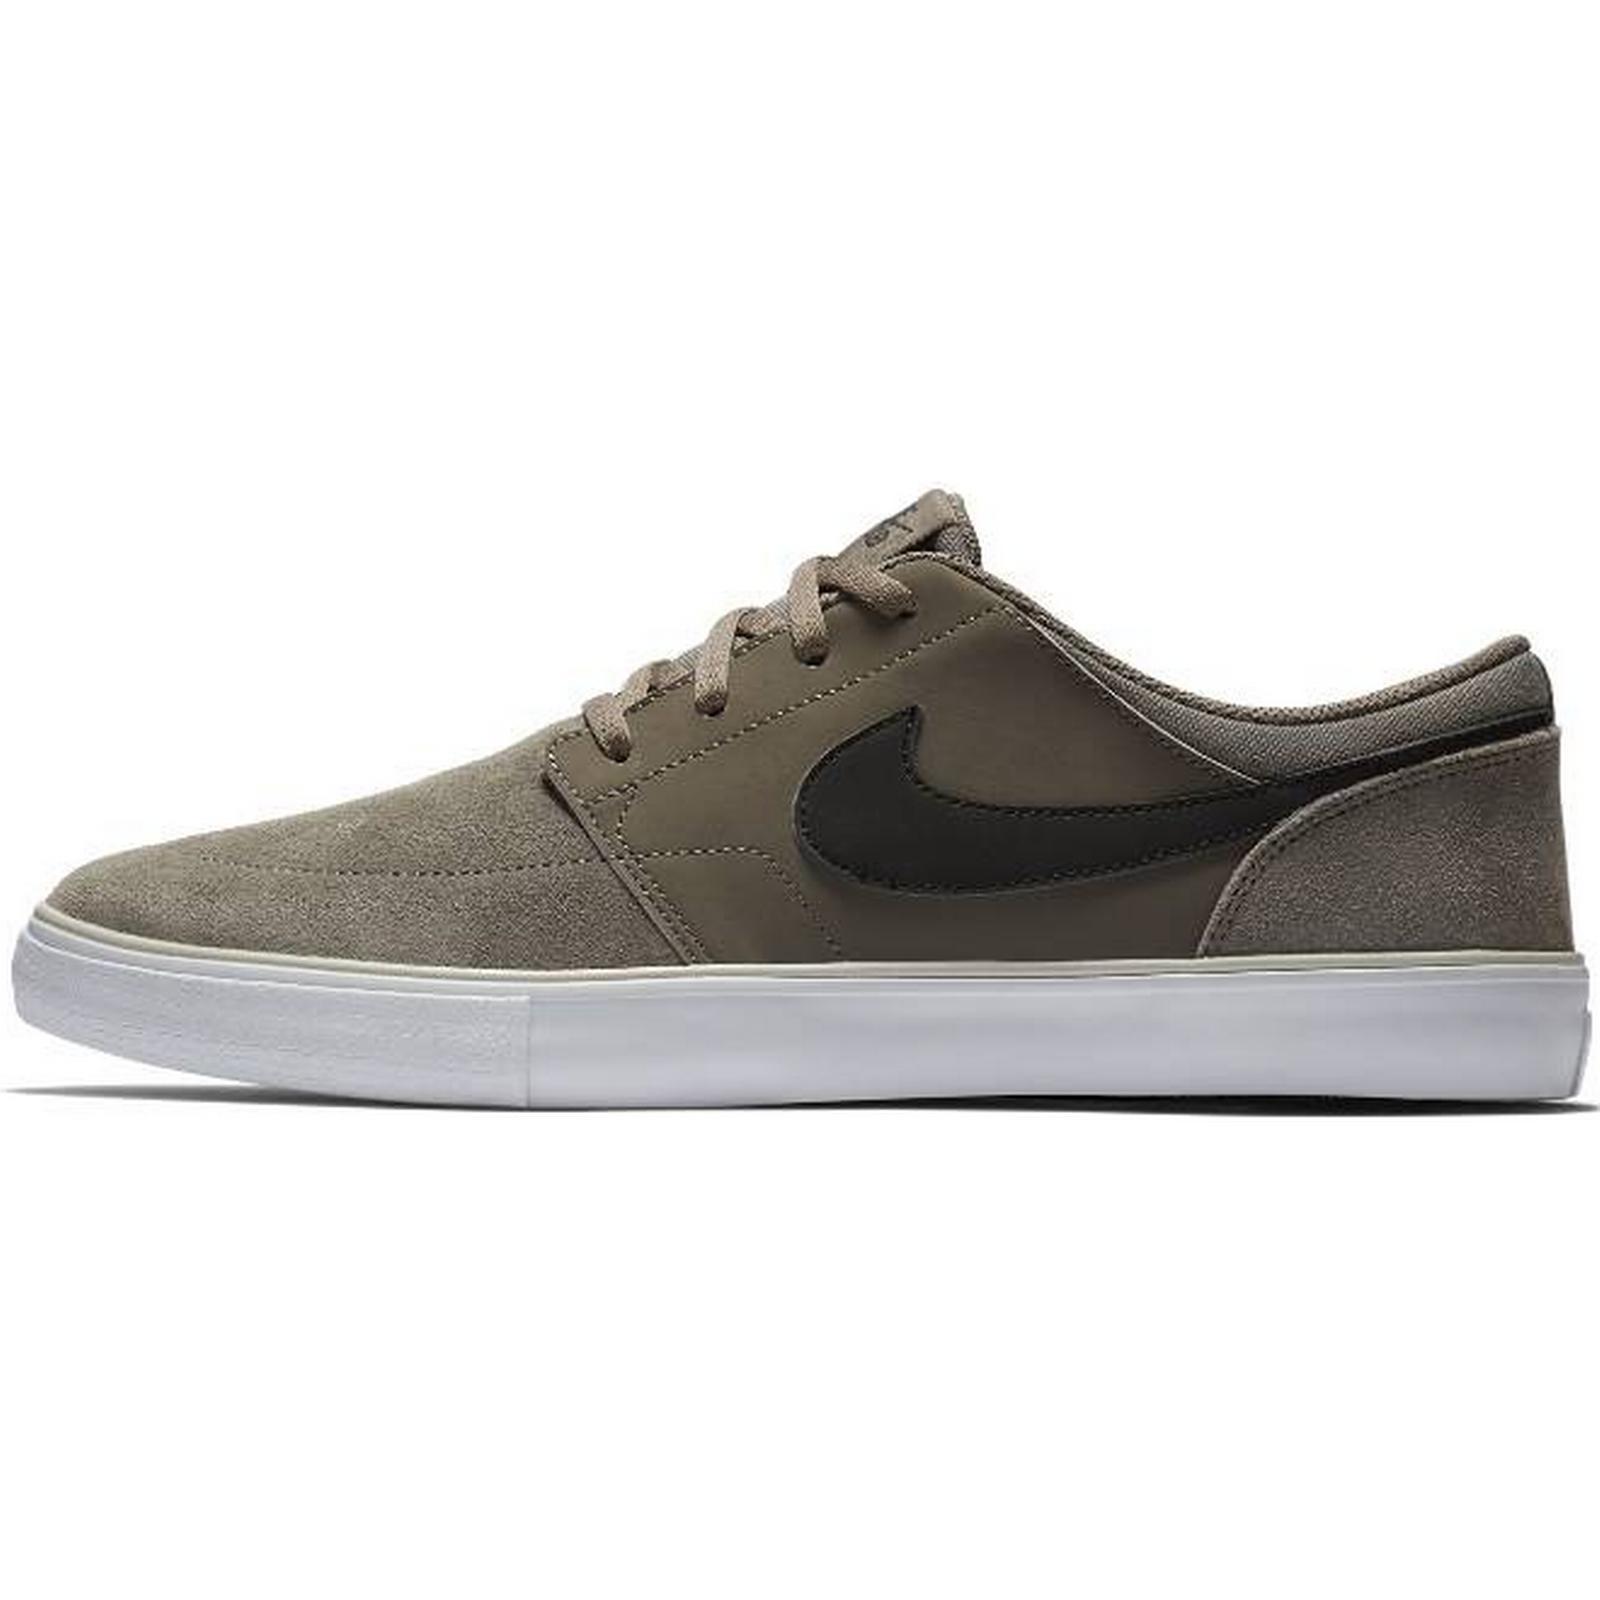 NIKE Męskie Buty Solarsoft Do Skateboardingu Nike SB Solarsoft Buty Portmore II 9594c4